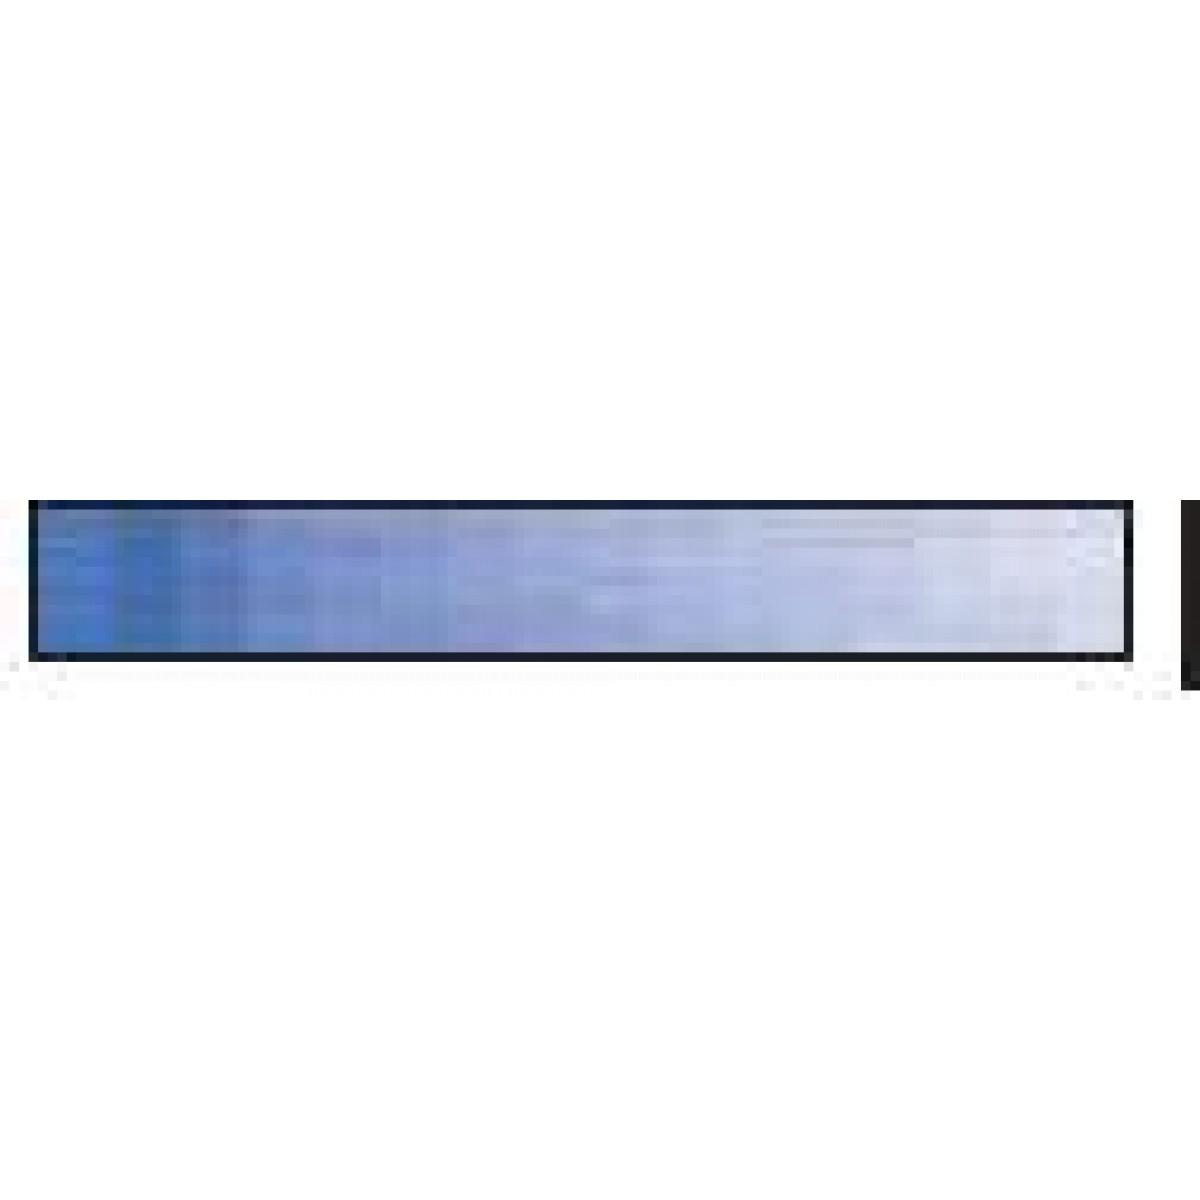 8510 Kunstnerkvalitet soft pastel Ultramarine